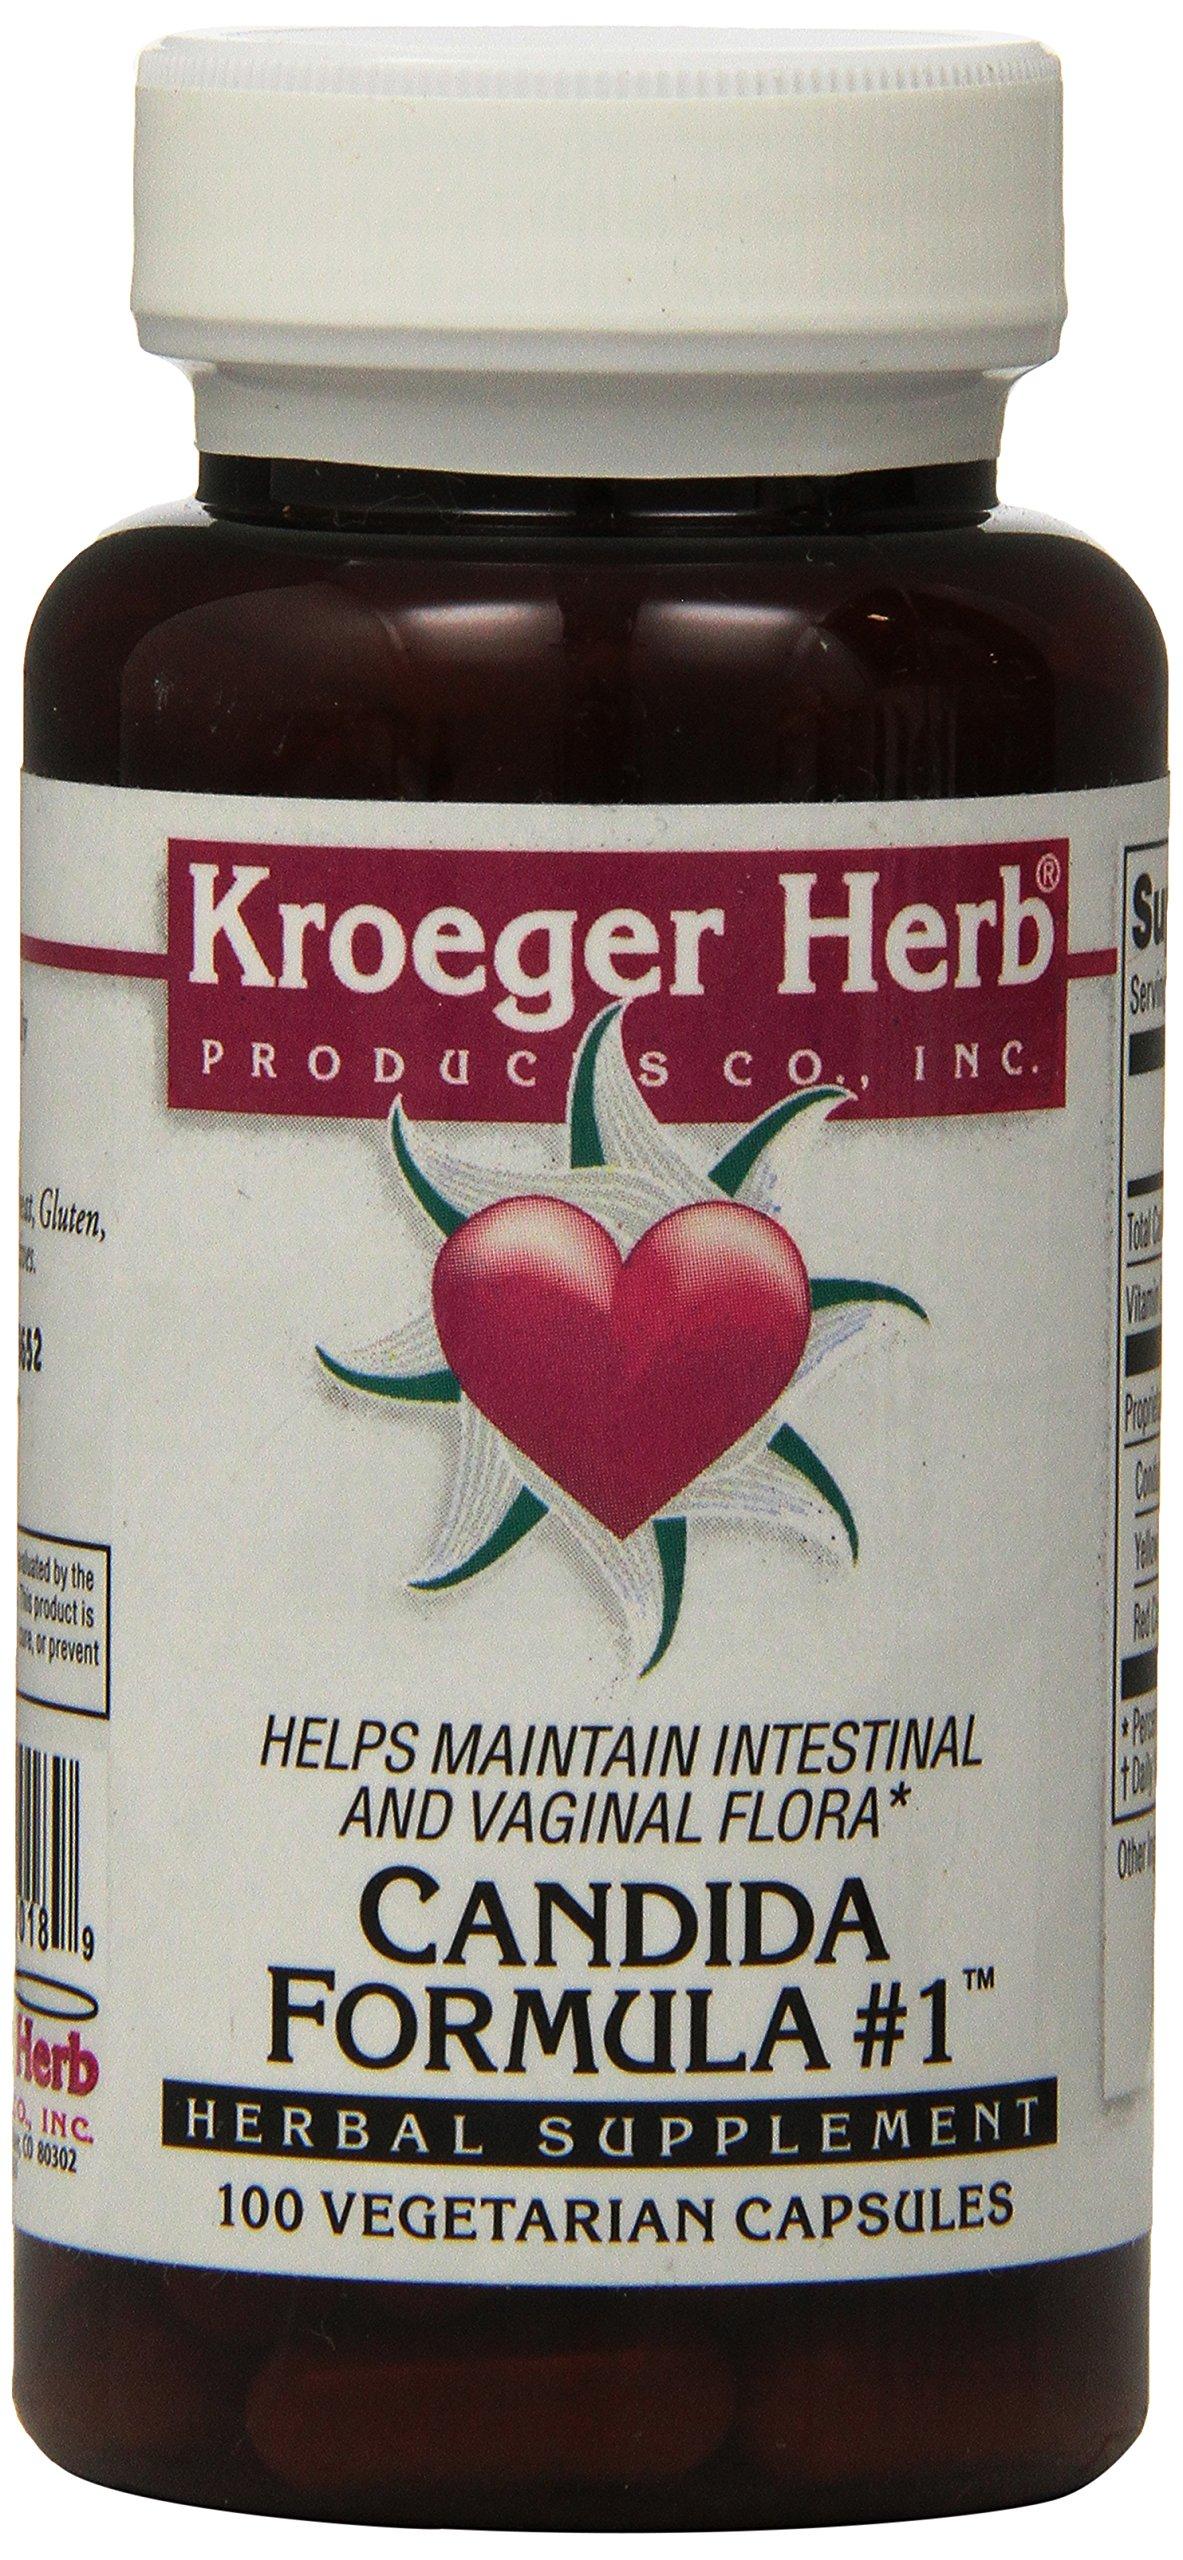 Kroeger Herb Candida Formula No 1 Capsules, 100 Count